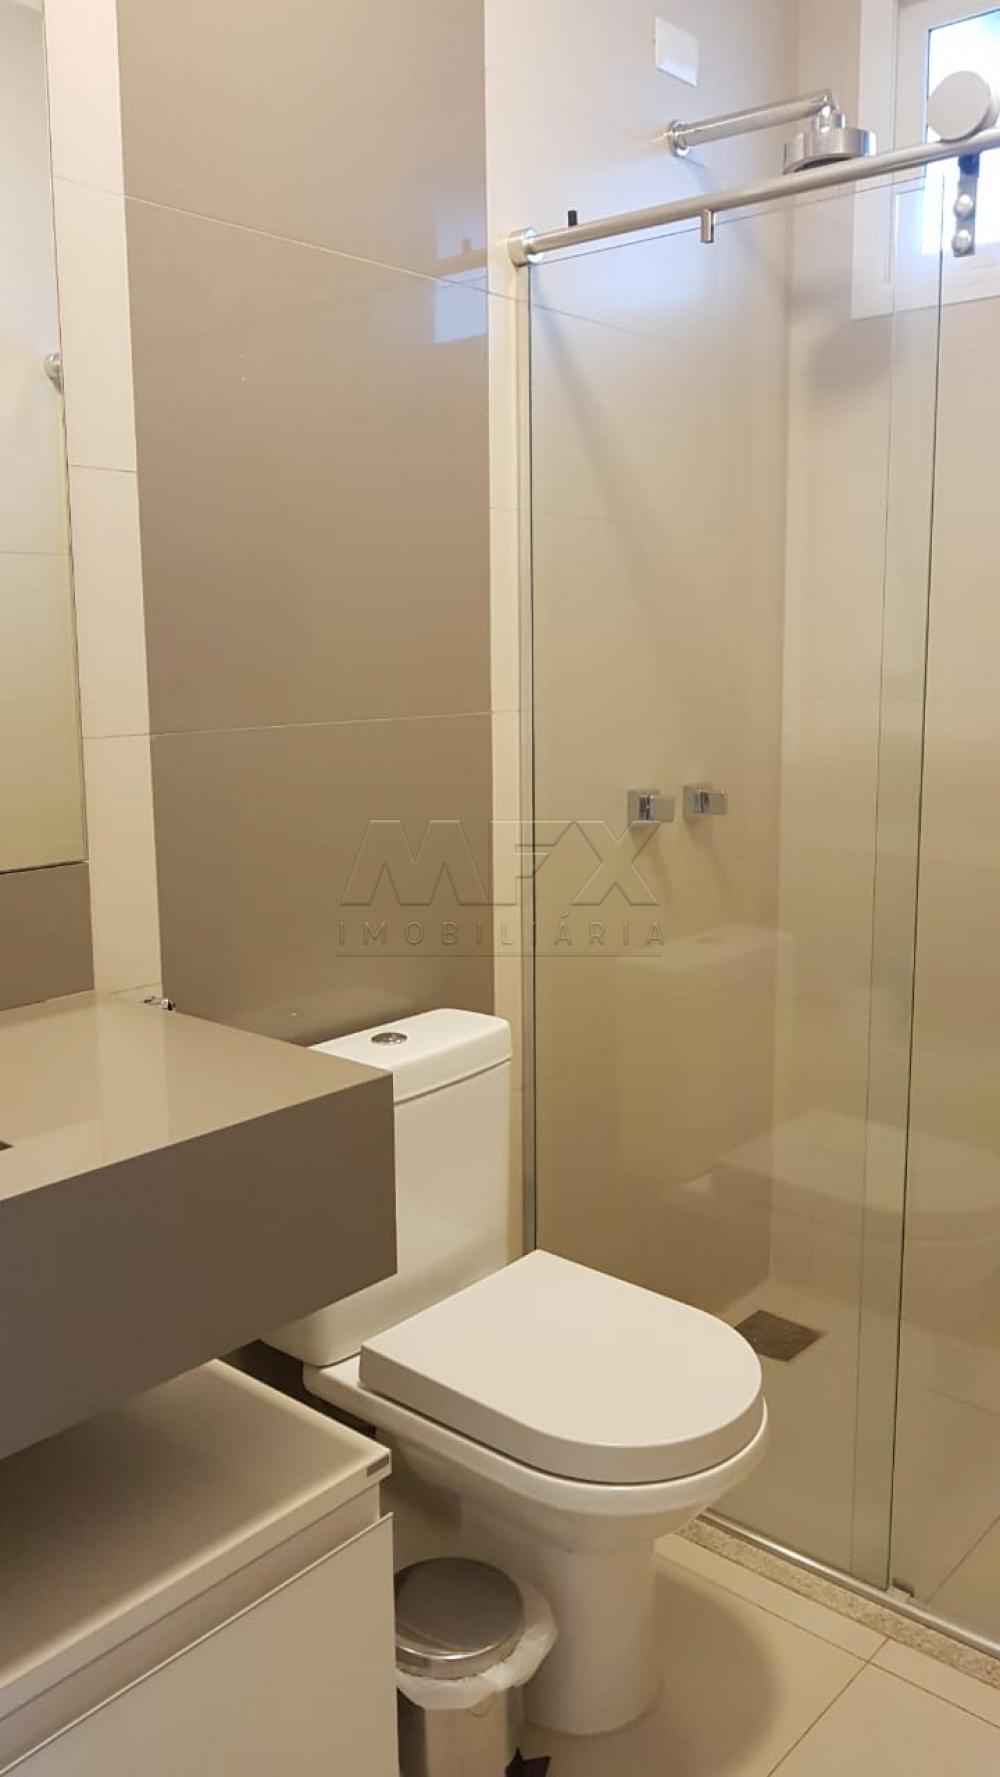 Comprar Casa / Condomínio em Bauru apenas R$ 1.500.000,00 - Foto 11